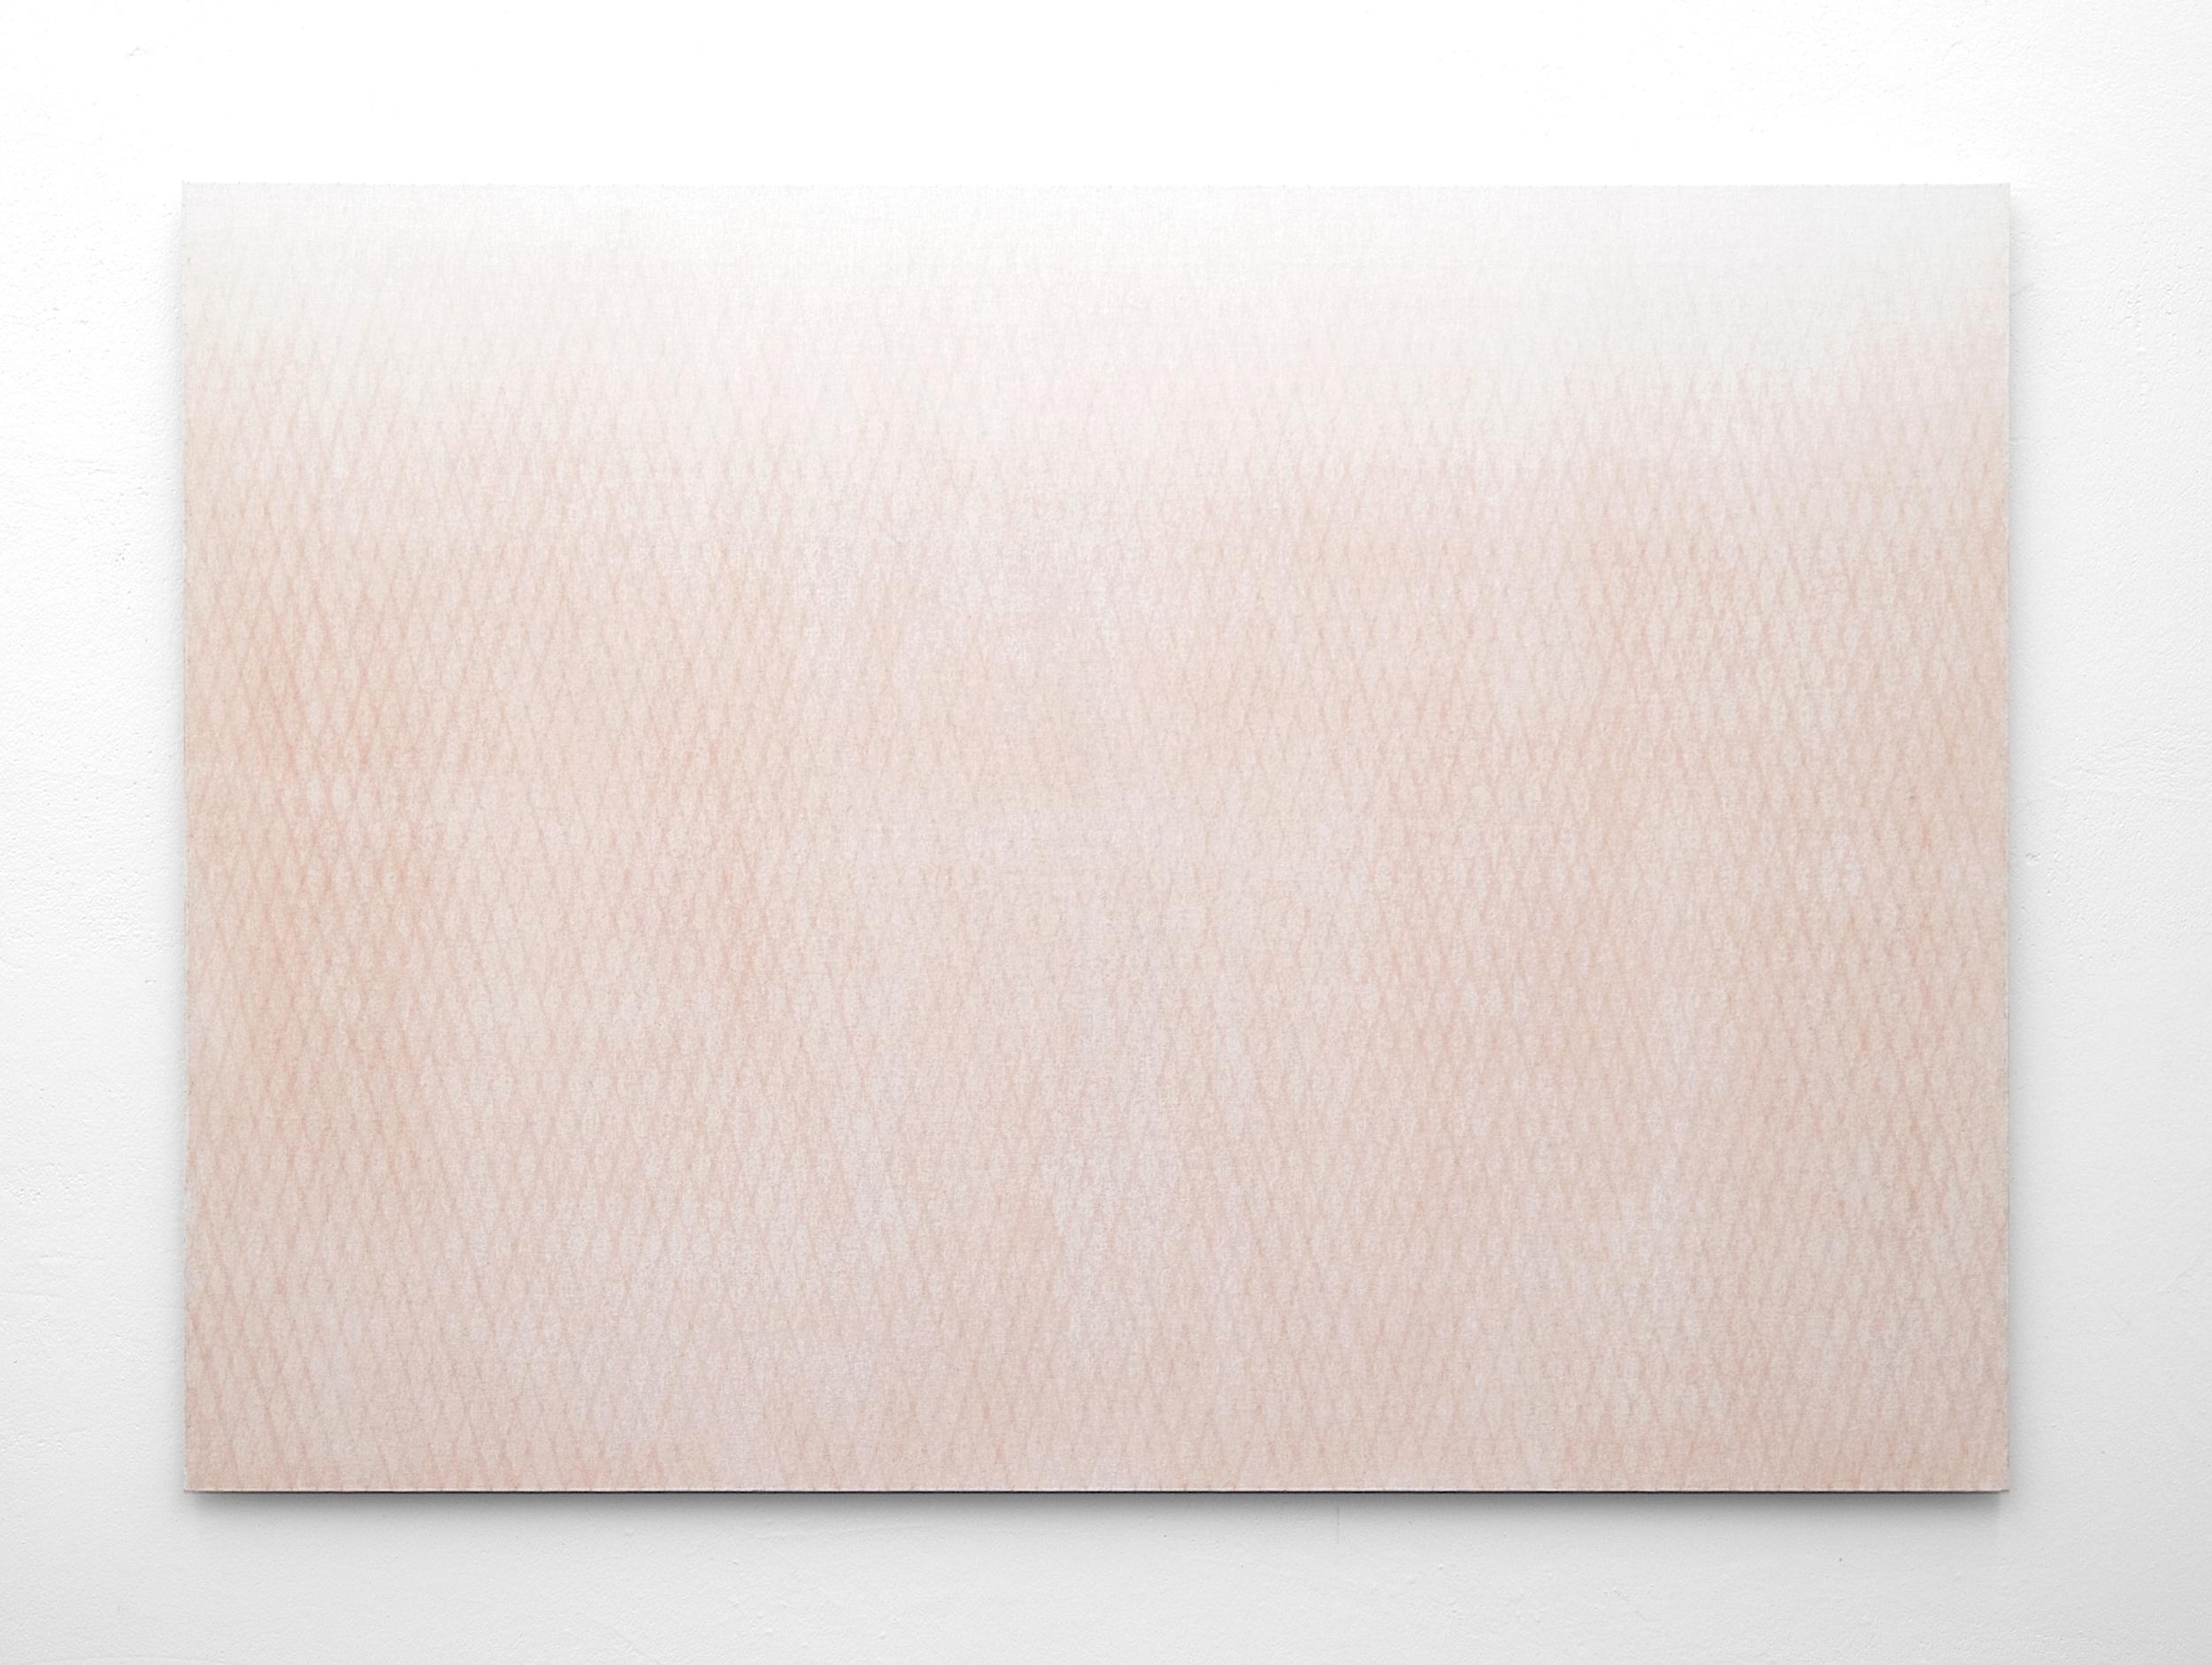 bild nr. 08/2011-100 x 140cm - acryl auf baumwolle/alu